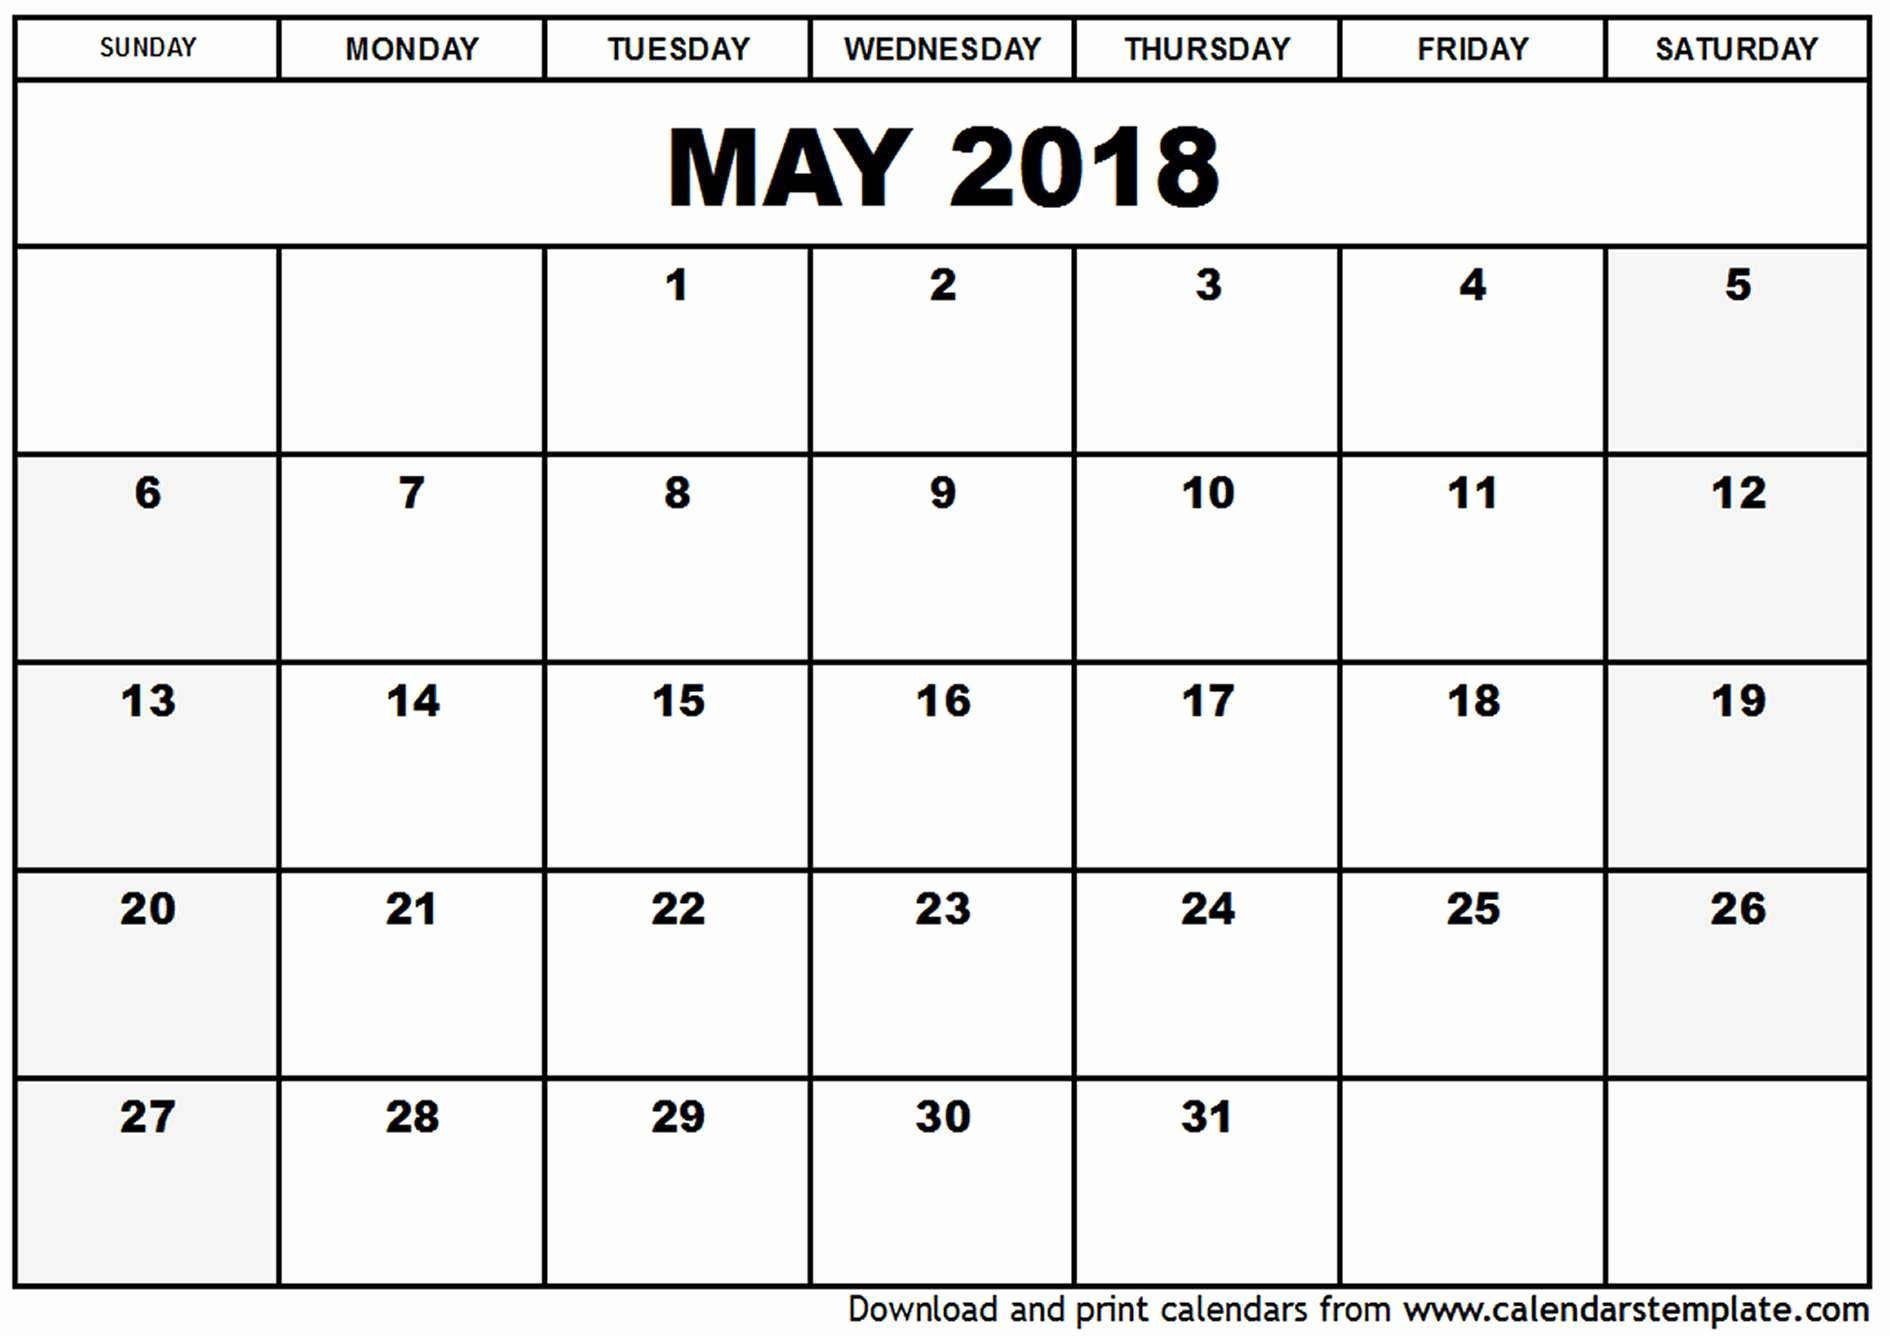 Free 2018 Monthly Calendar Template Best Of May 2018 Calendar Template